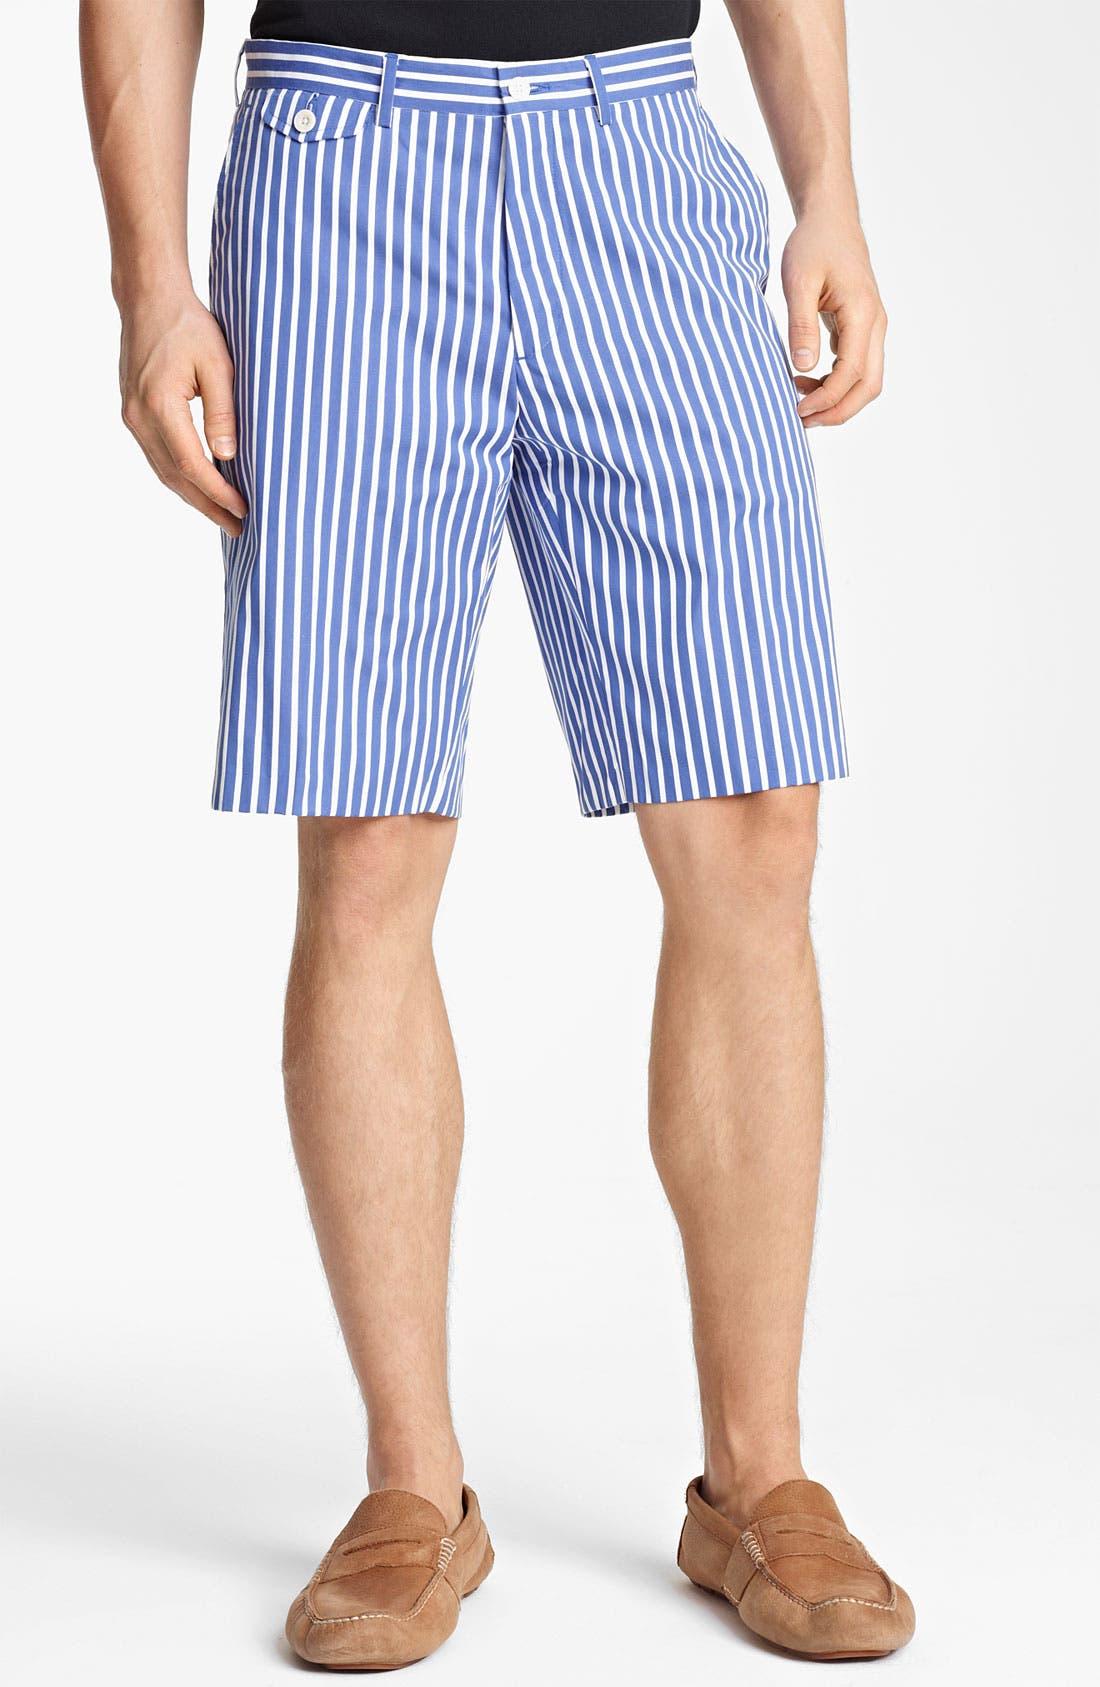 Alternate Image 1 Selected - Polo Ralph Lauren 'Preston' Shorts